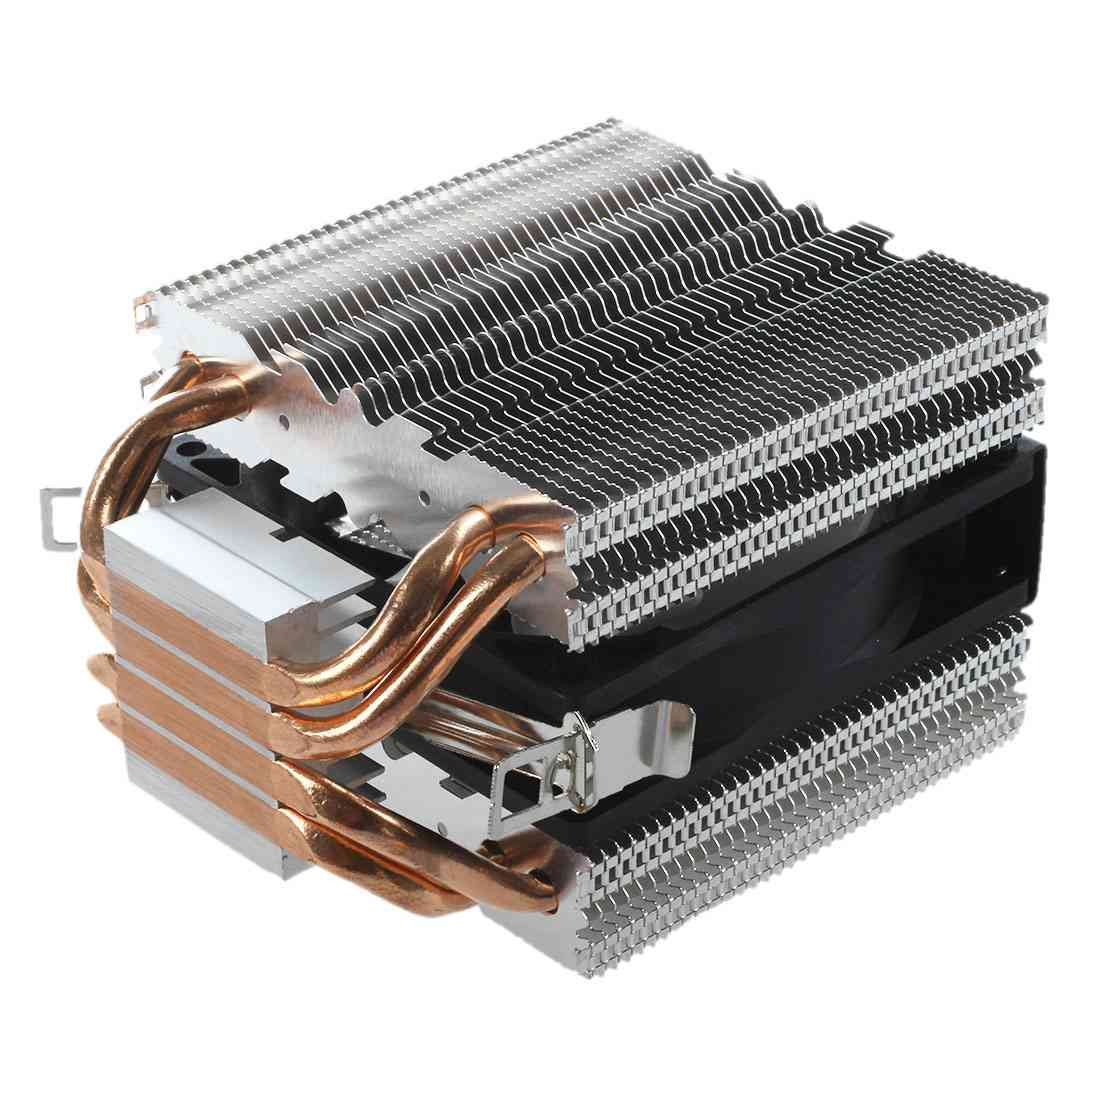 4 Heatpipe CPU Cooler Heat Sink for Intel LGA 1150 1151 1155 775 1156 AMD New